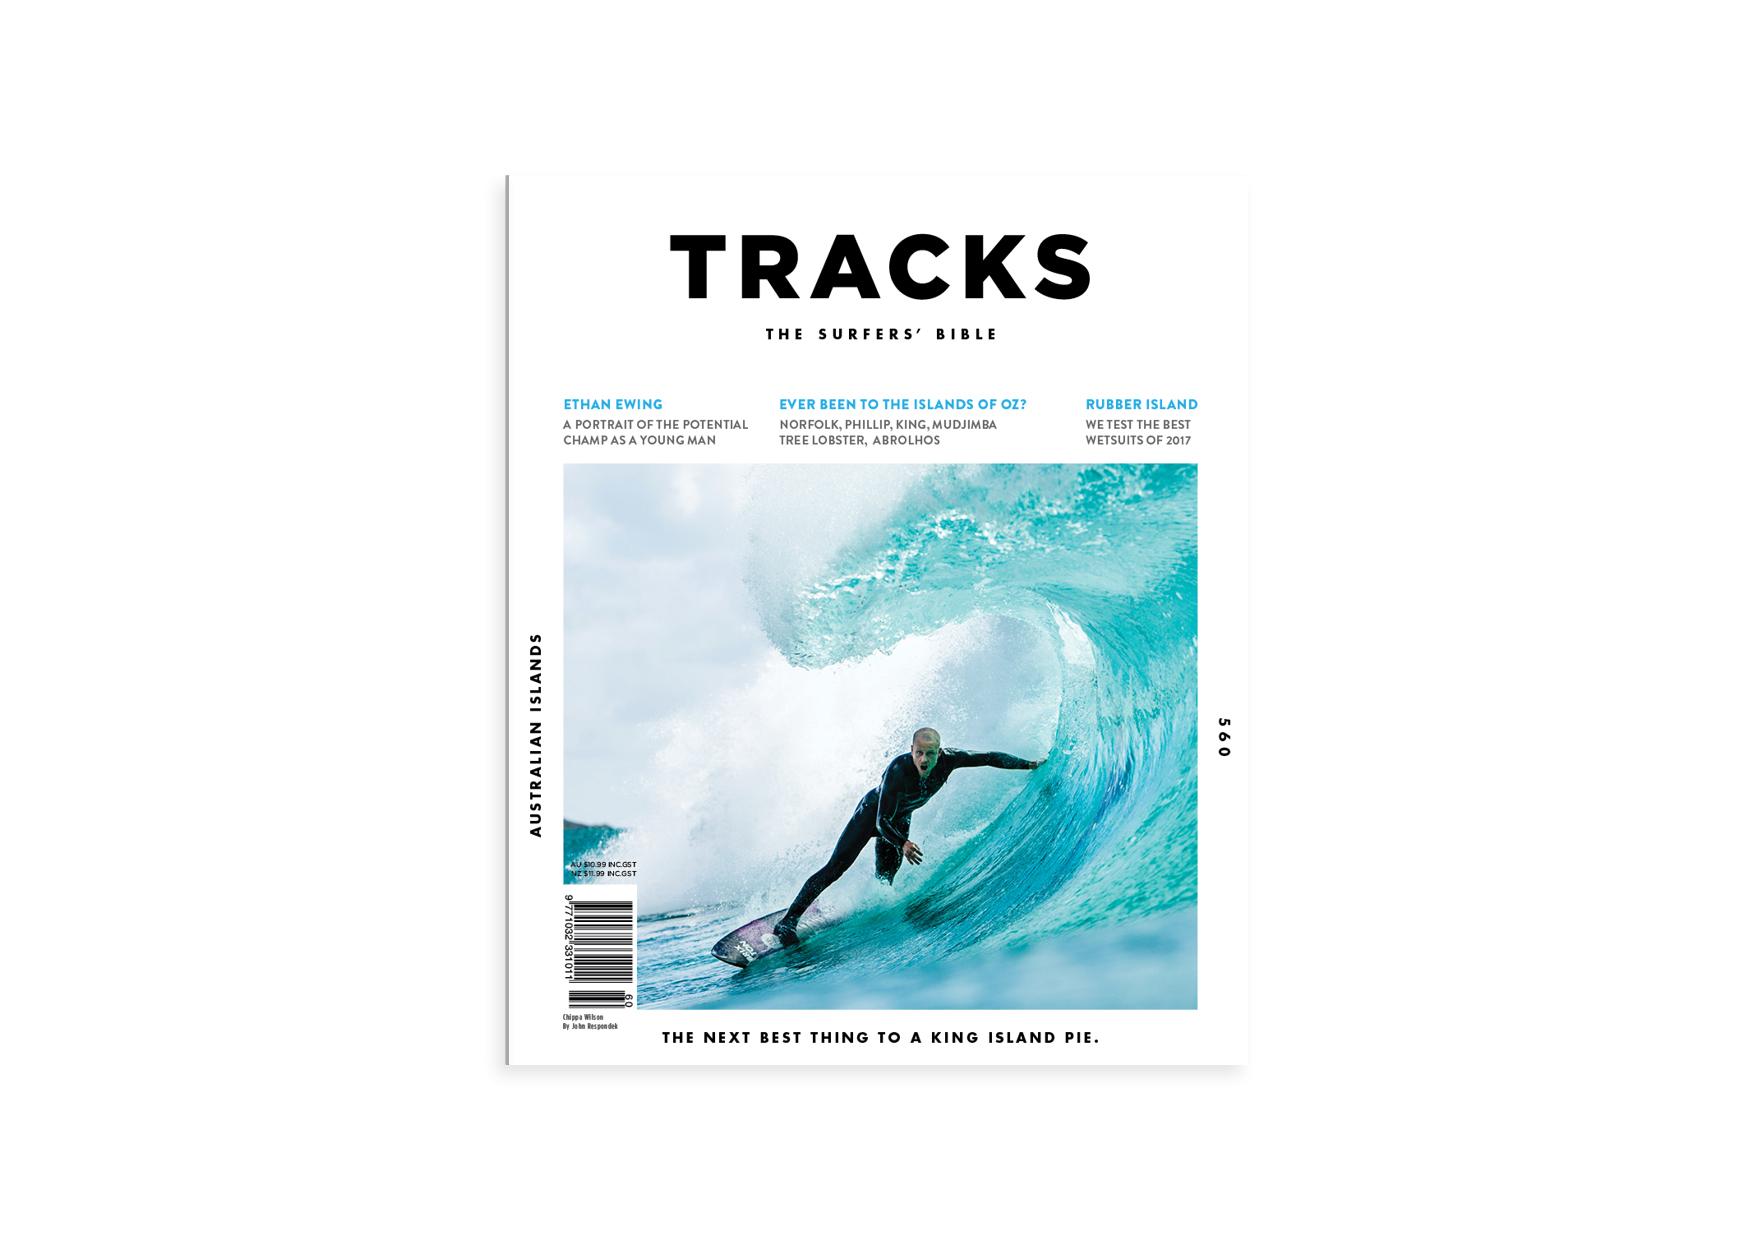 Tracks Magazine Re-Brand